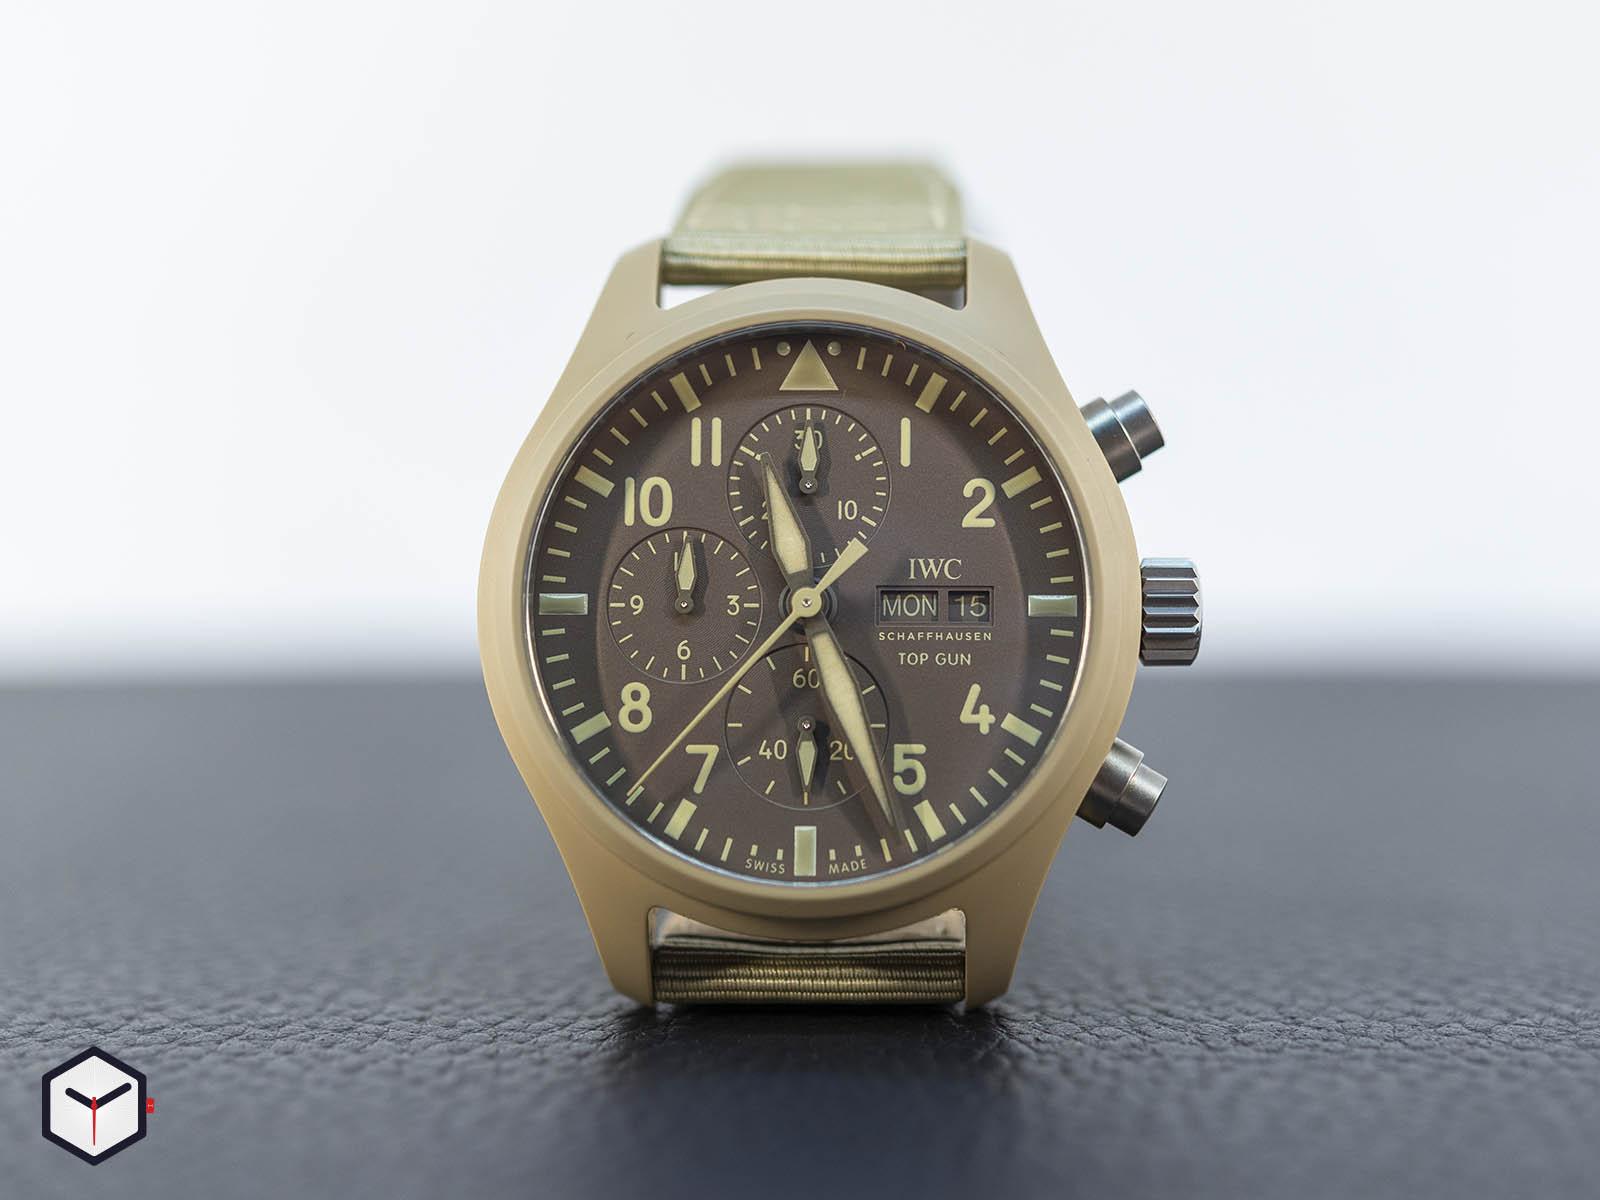 iw389103-iwc-pilot-s-watch-chronograph-top-gun-edition-mojave-desert-sihh-2019-2.jpg